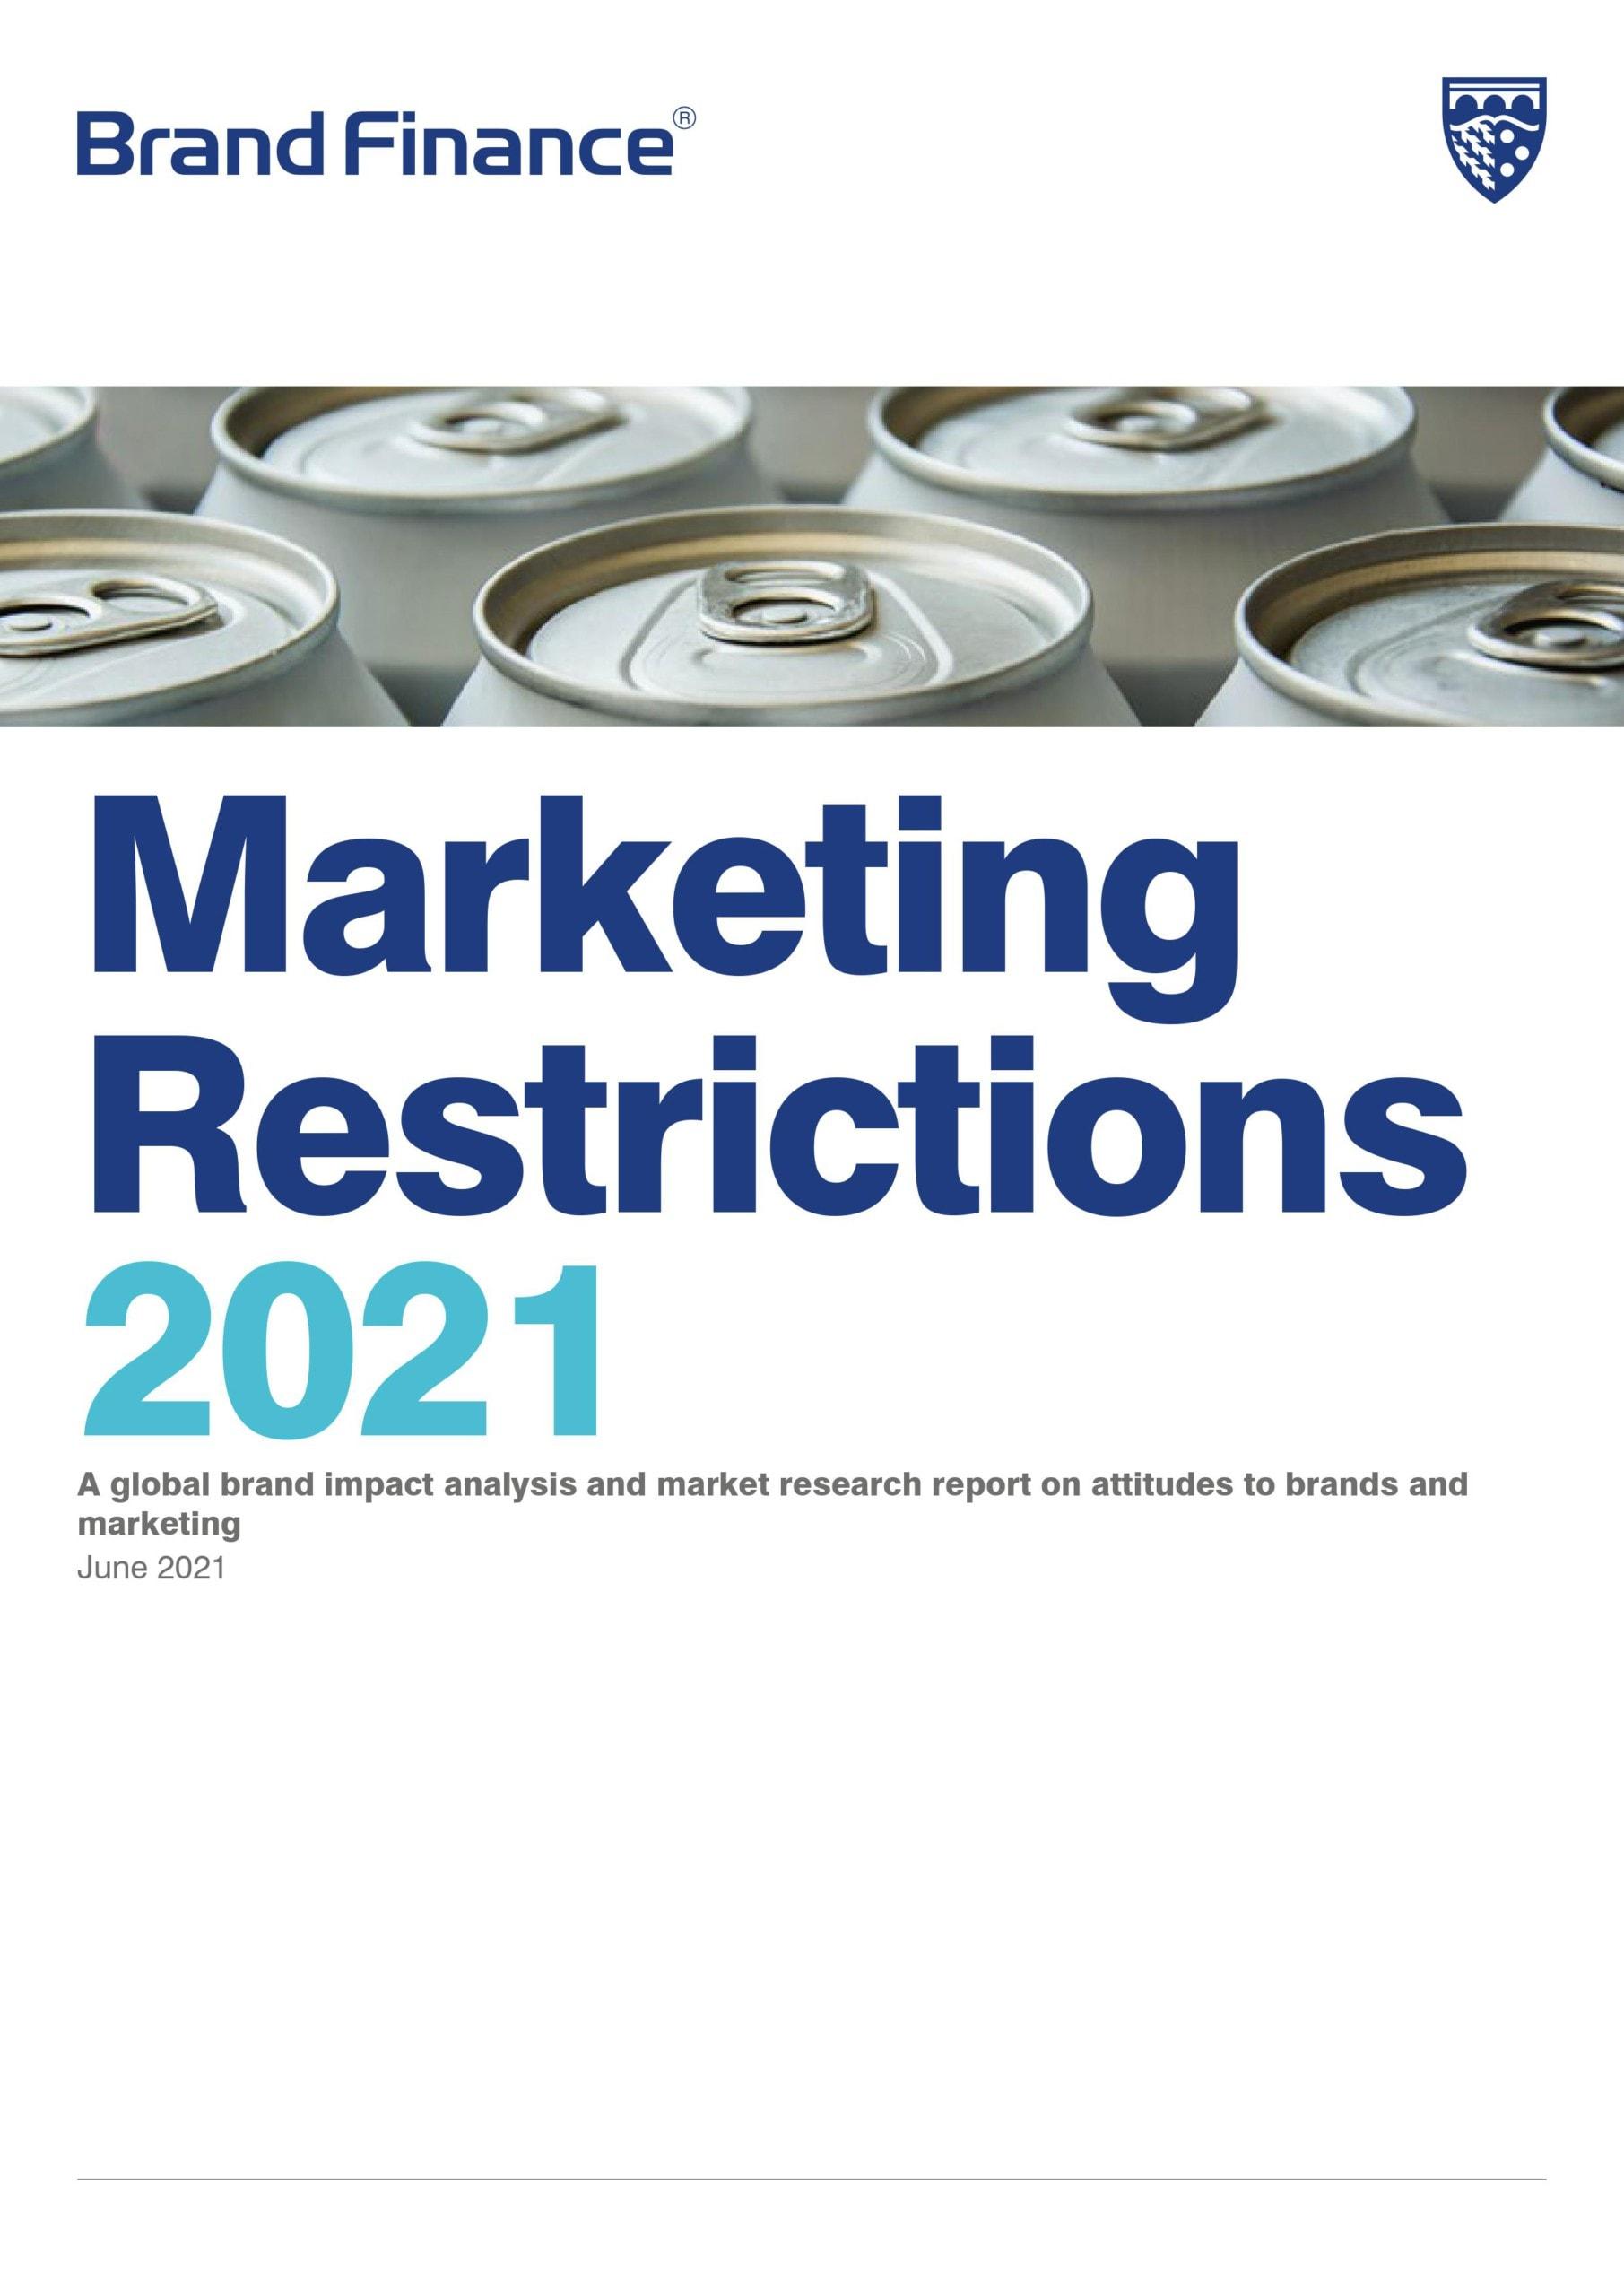 Marketing Restrictions